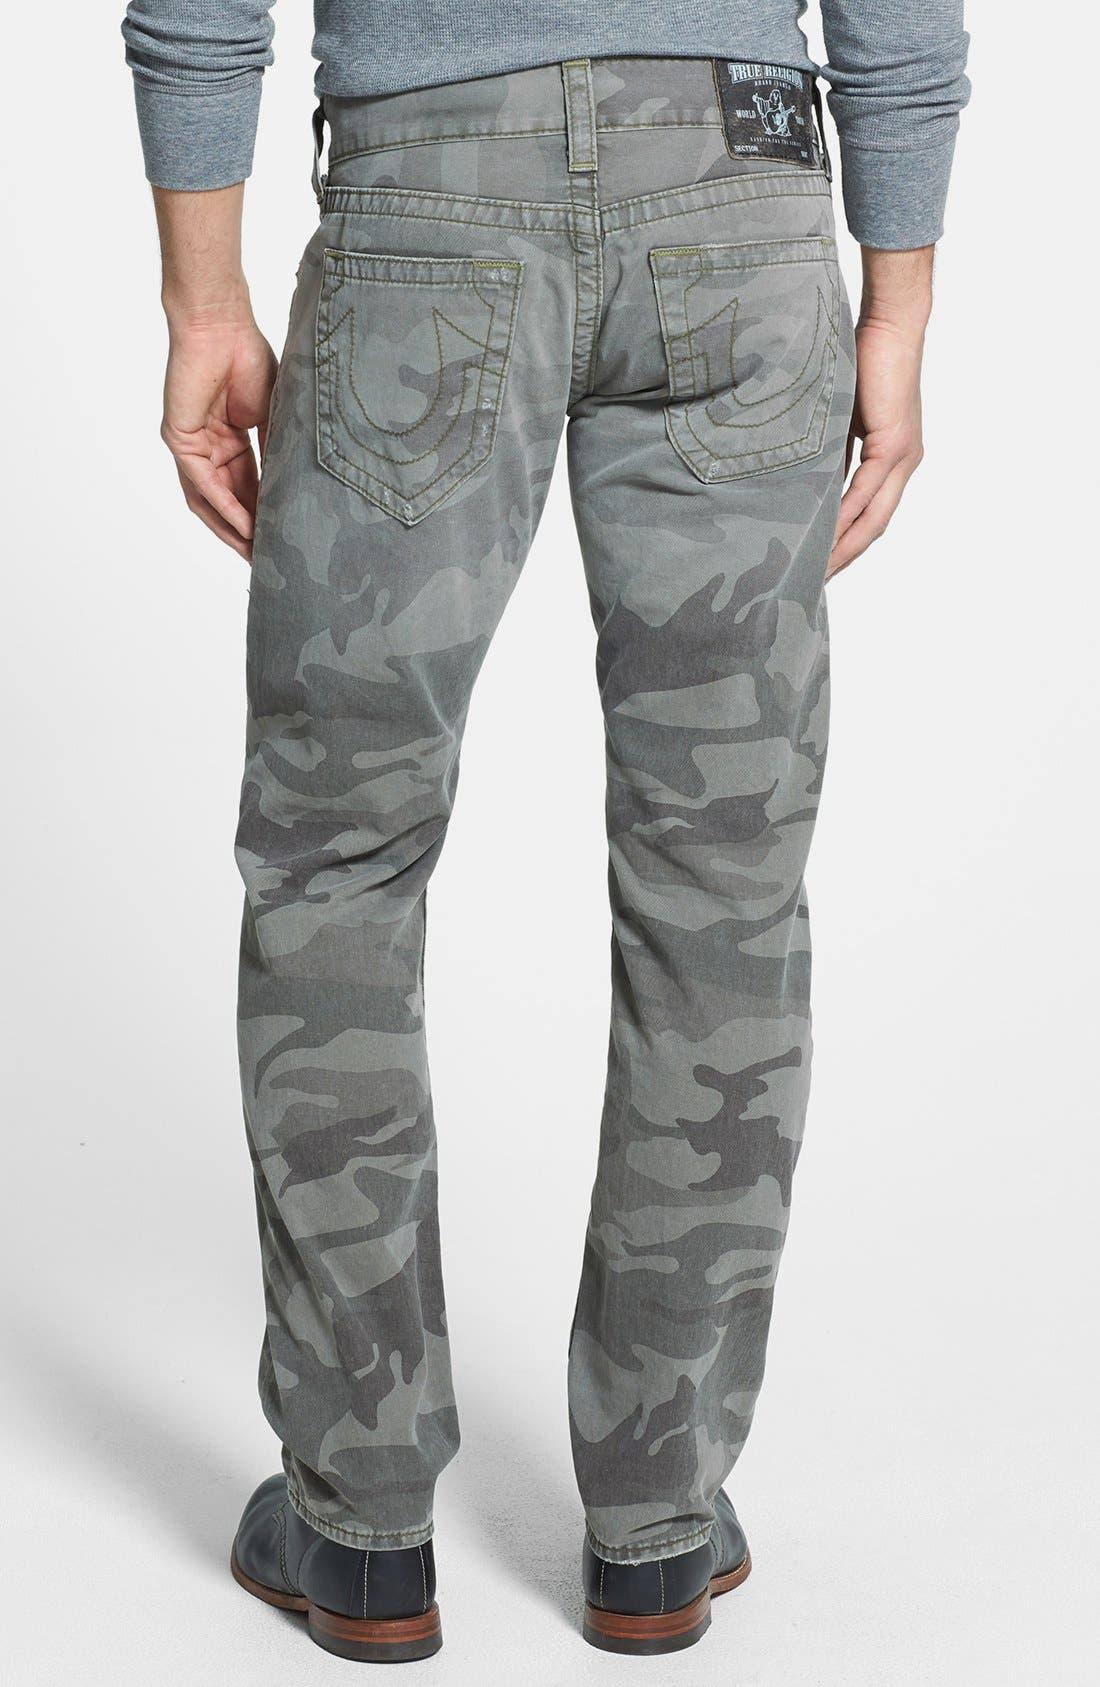 Alternate Image 1 Selected - True Religion Brand Jeans 'Geno' Straight Leg Camo Jeans (Abn Deringer)